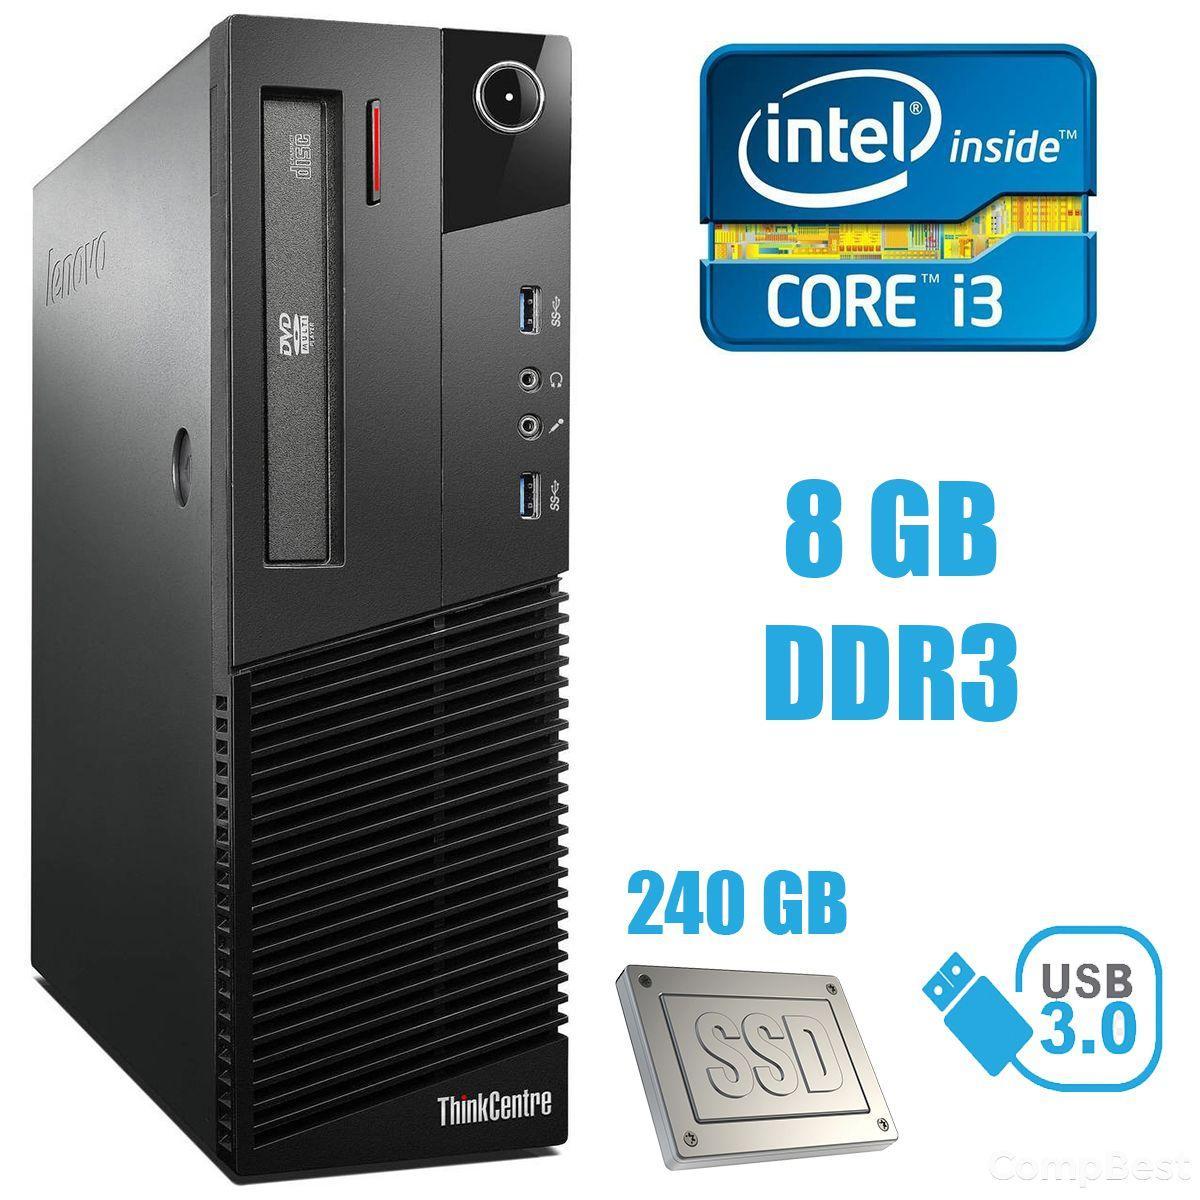 Lenovo M83 SFF / Intel Core i3-4130 (2(4) ядра по 3.4GHz) / 8GB DDR3 / 240 GB SSD / USB 3.0